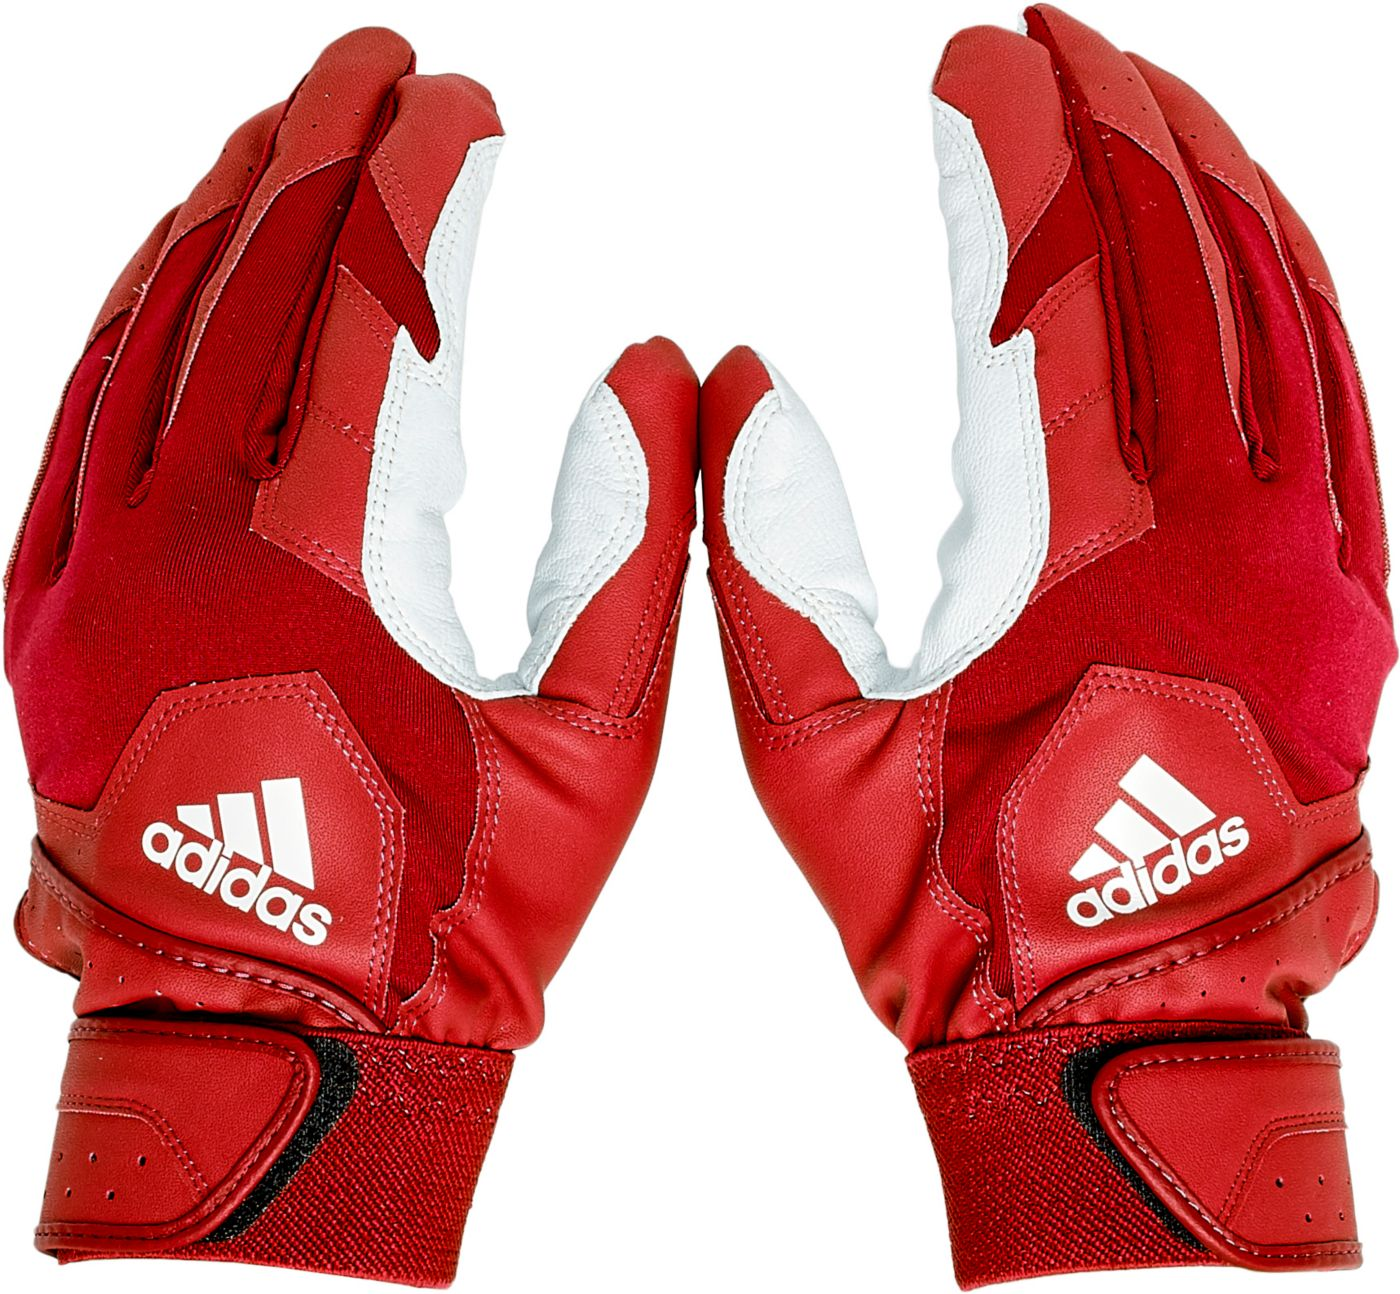 adidas Adult Trilogy Series Batting Gloves